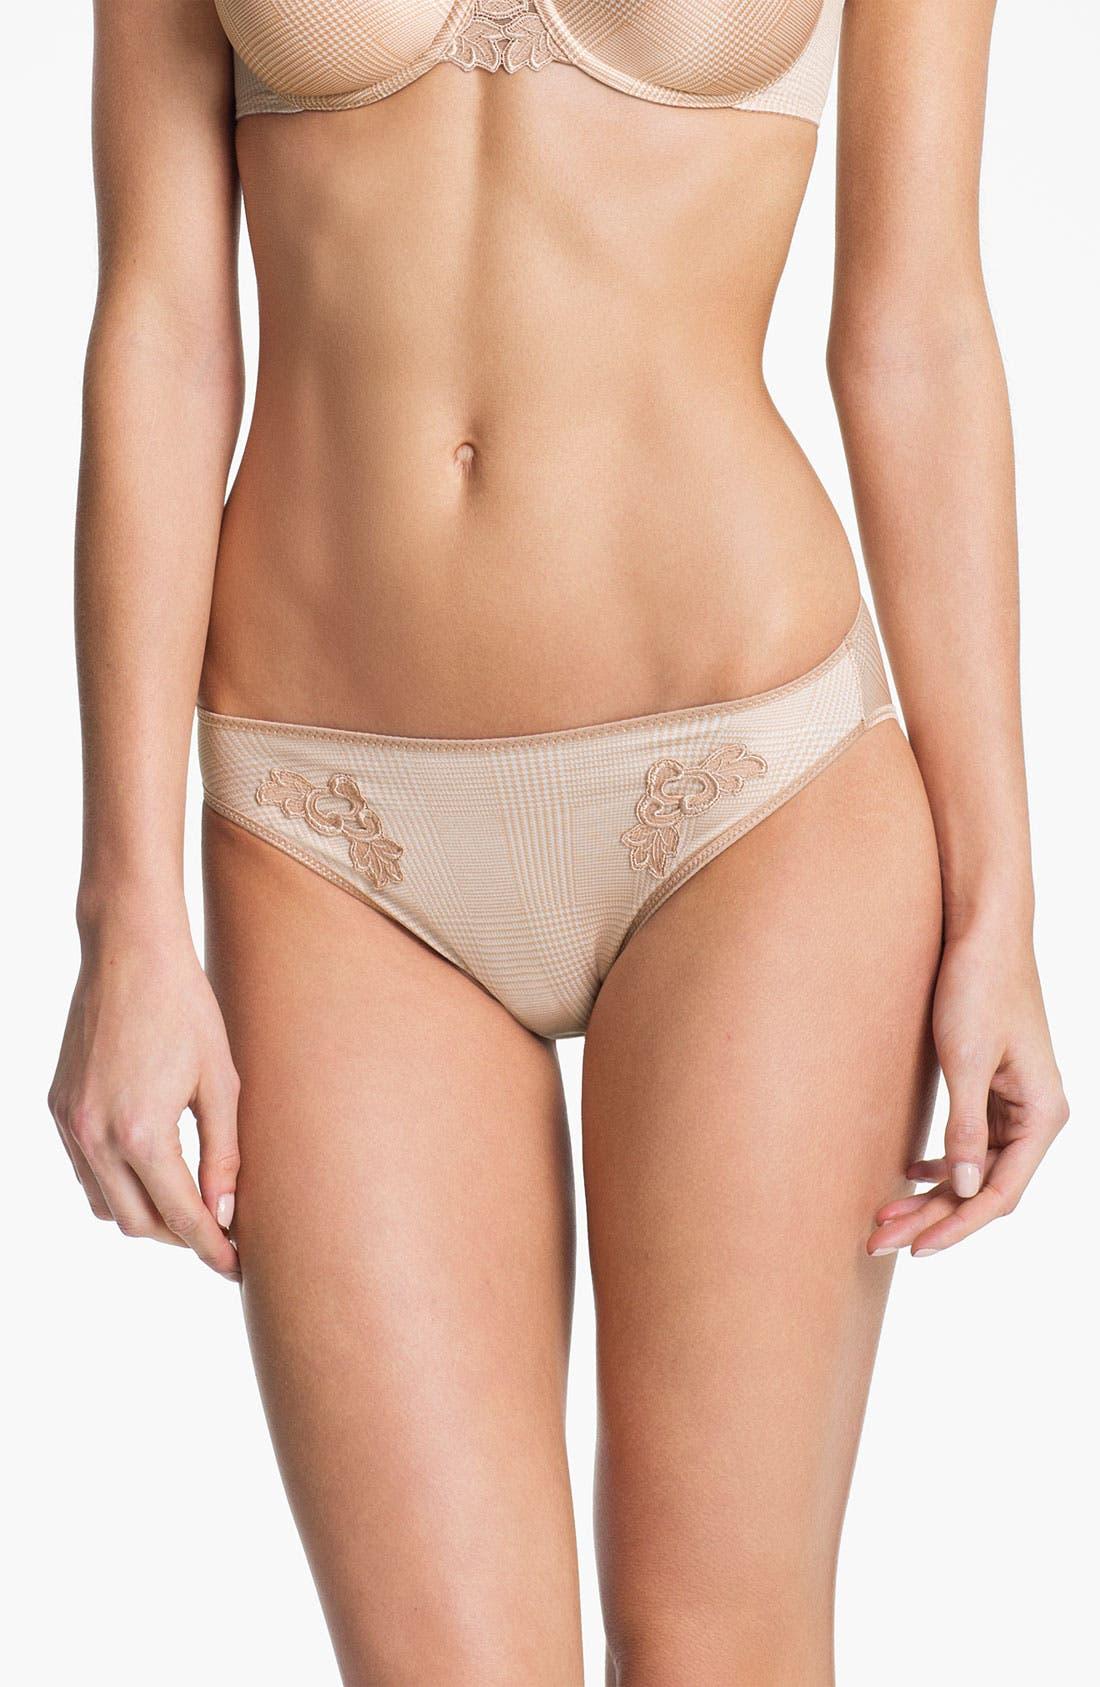 Alternate Image 1 Selected - Chantelle Intimates 'Hedona' Bikini